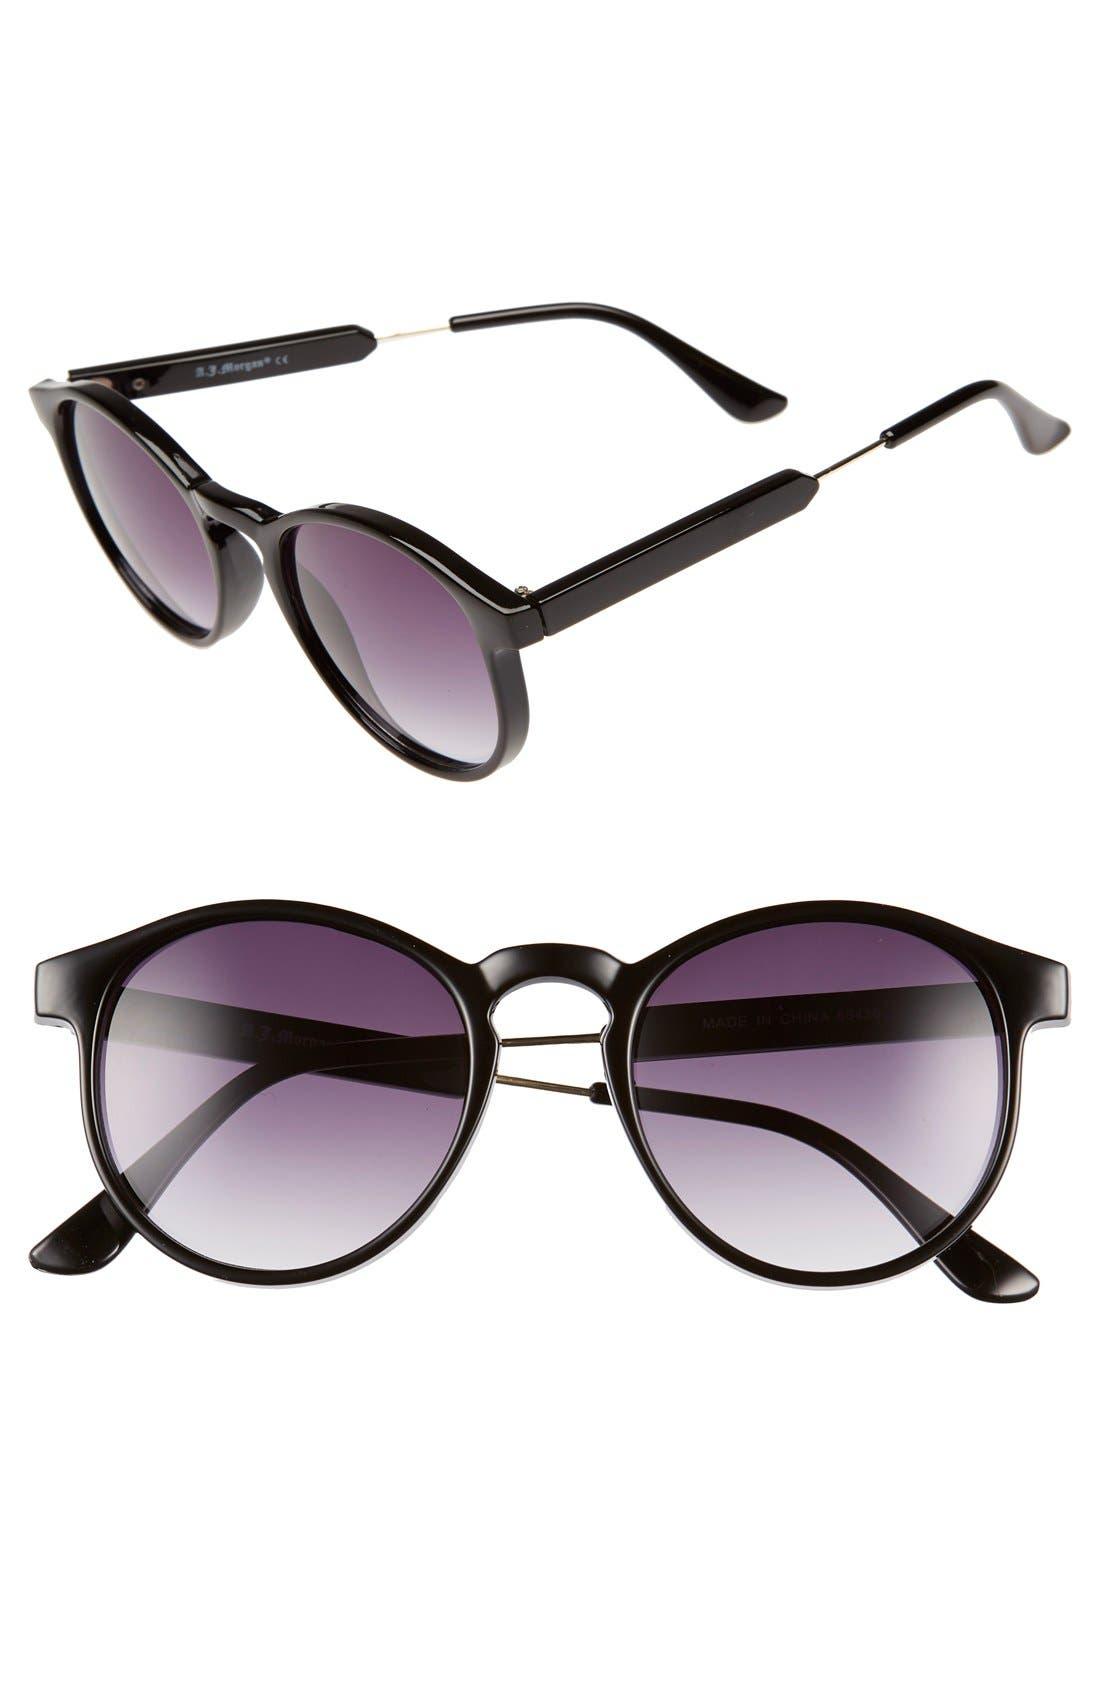 Main Image - A.J. Morgan 50mm Sunglasses